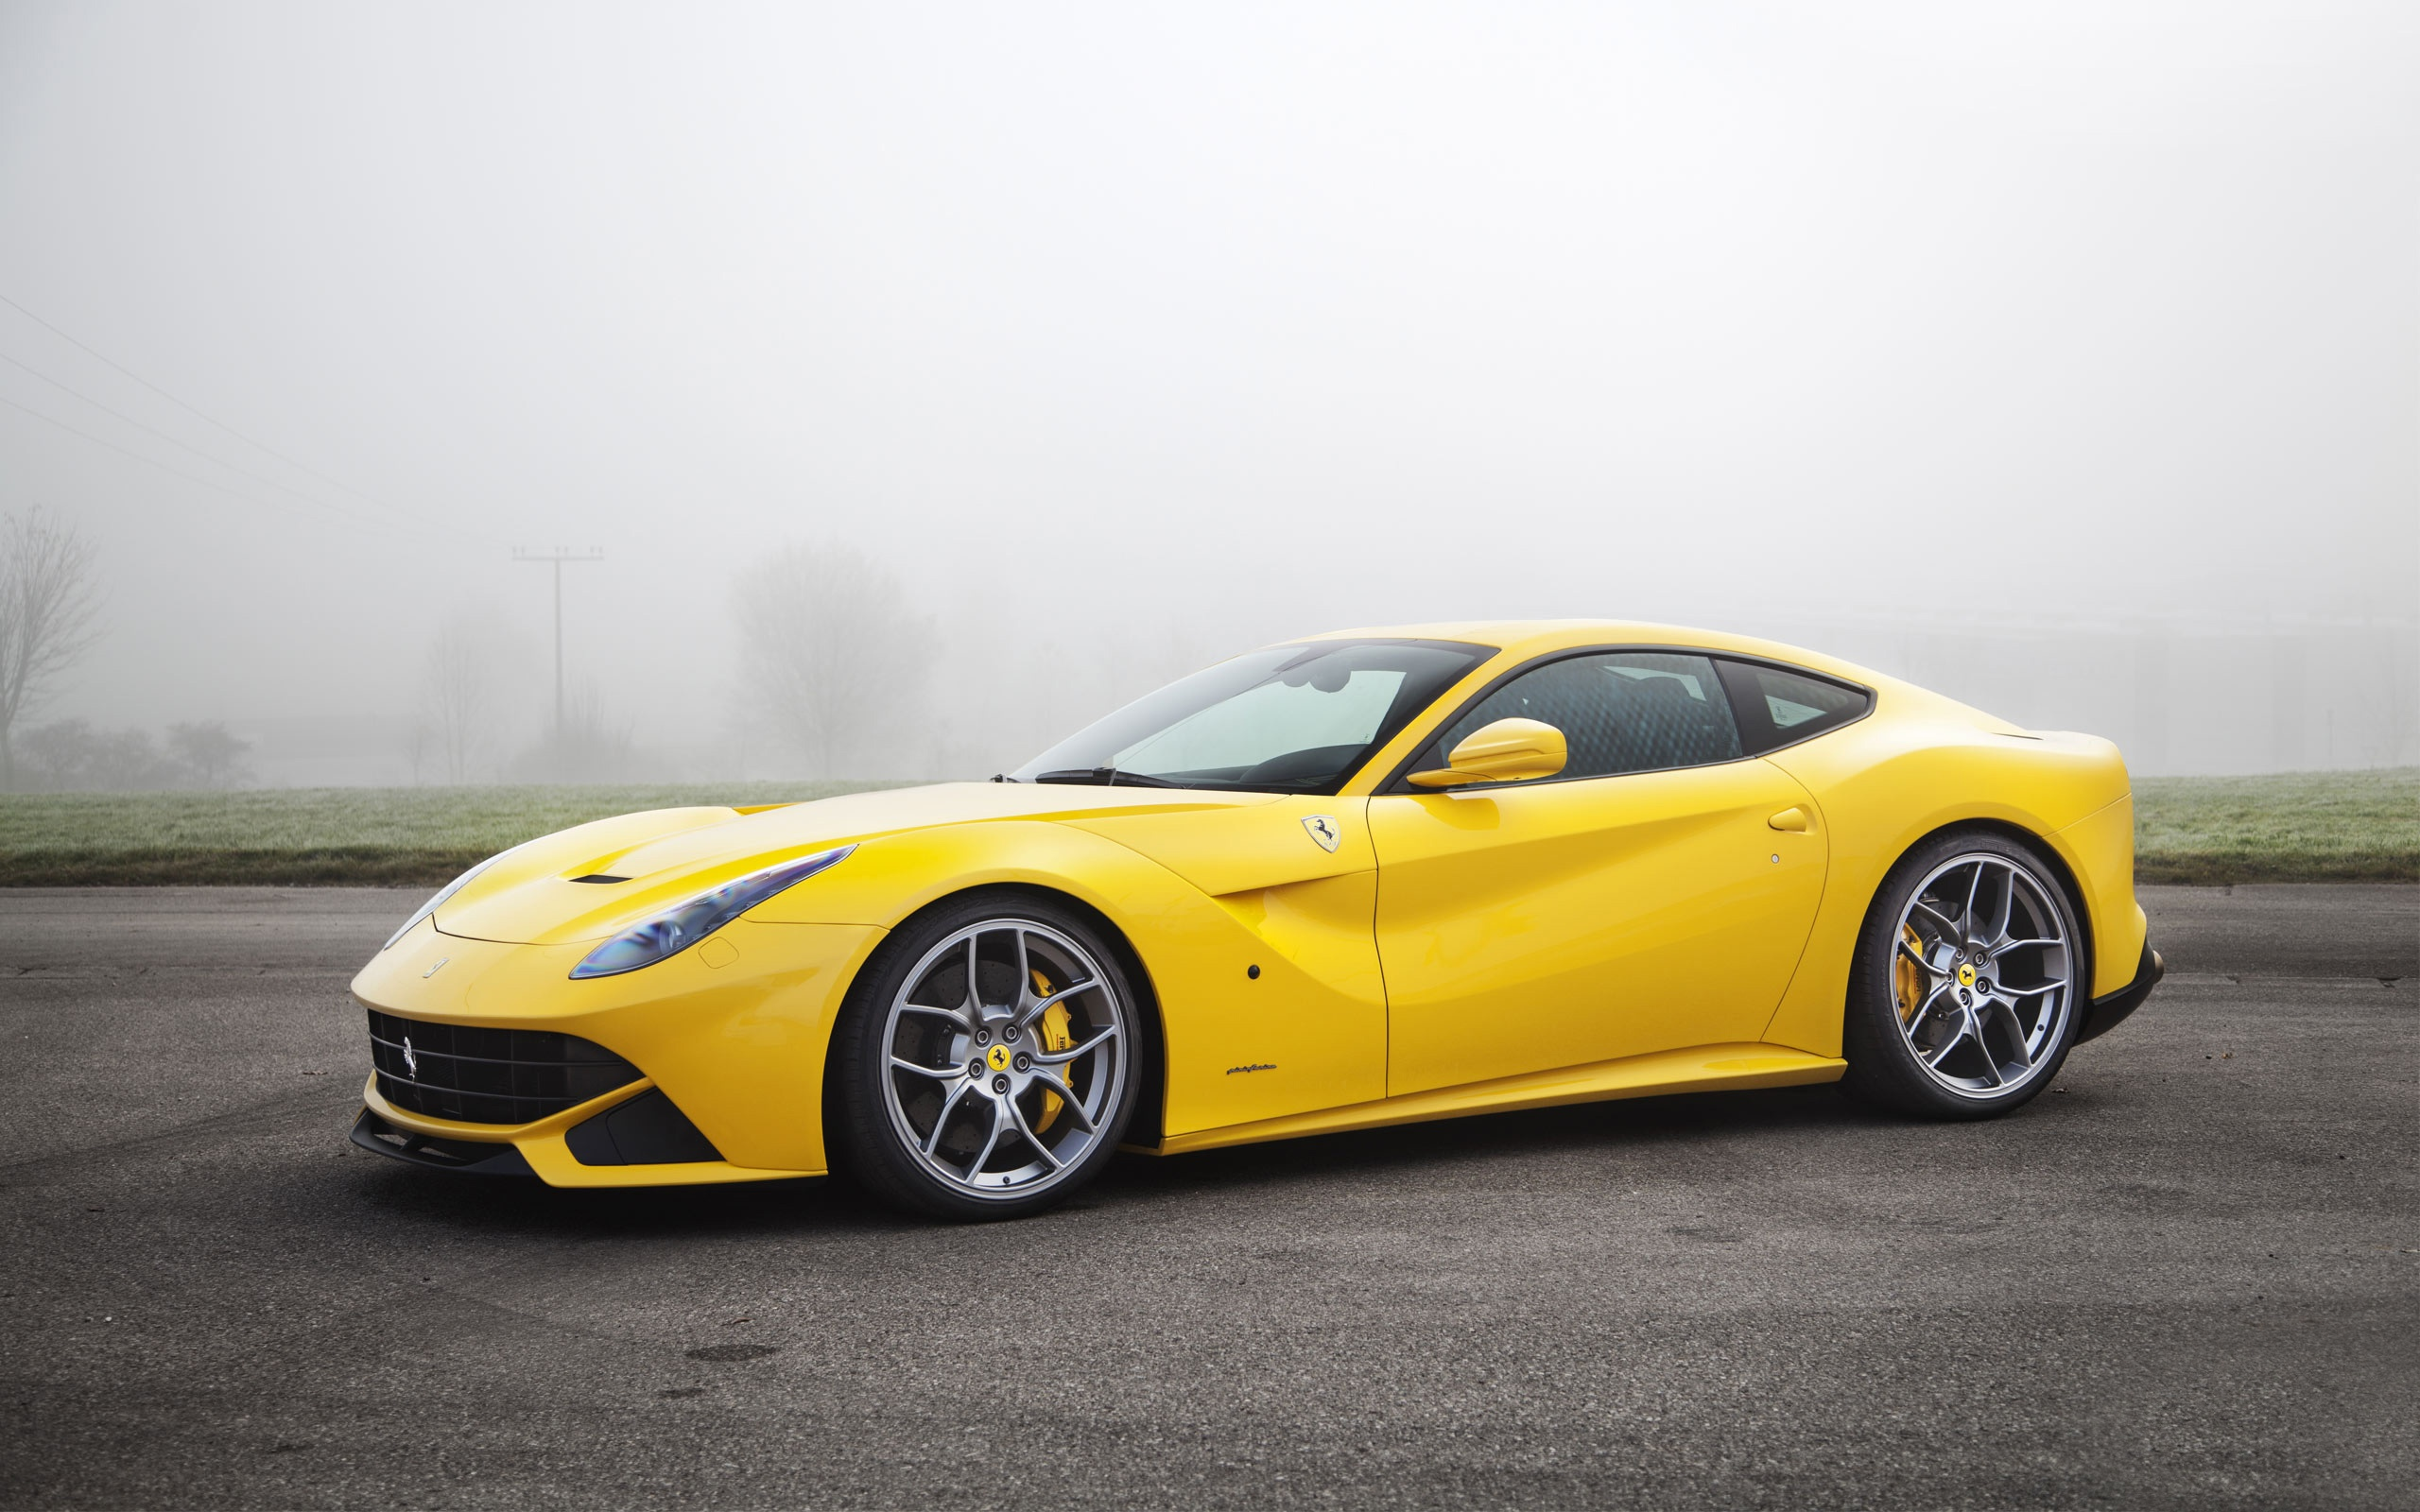 Wallpaper Ferrari F12 Yellow Supercar 2560x1600 Hd Picture Image